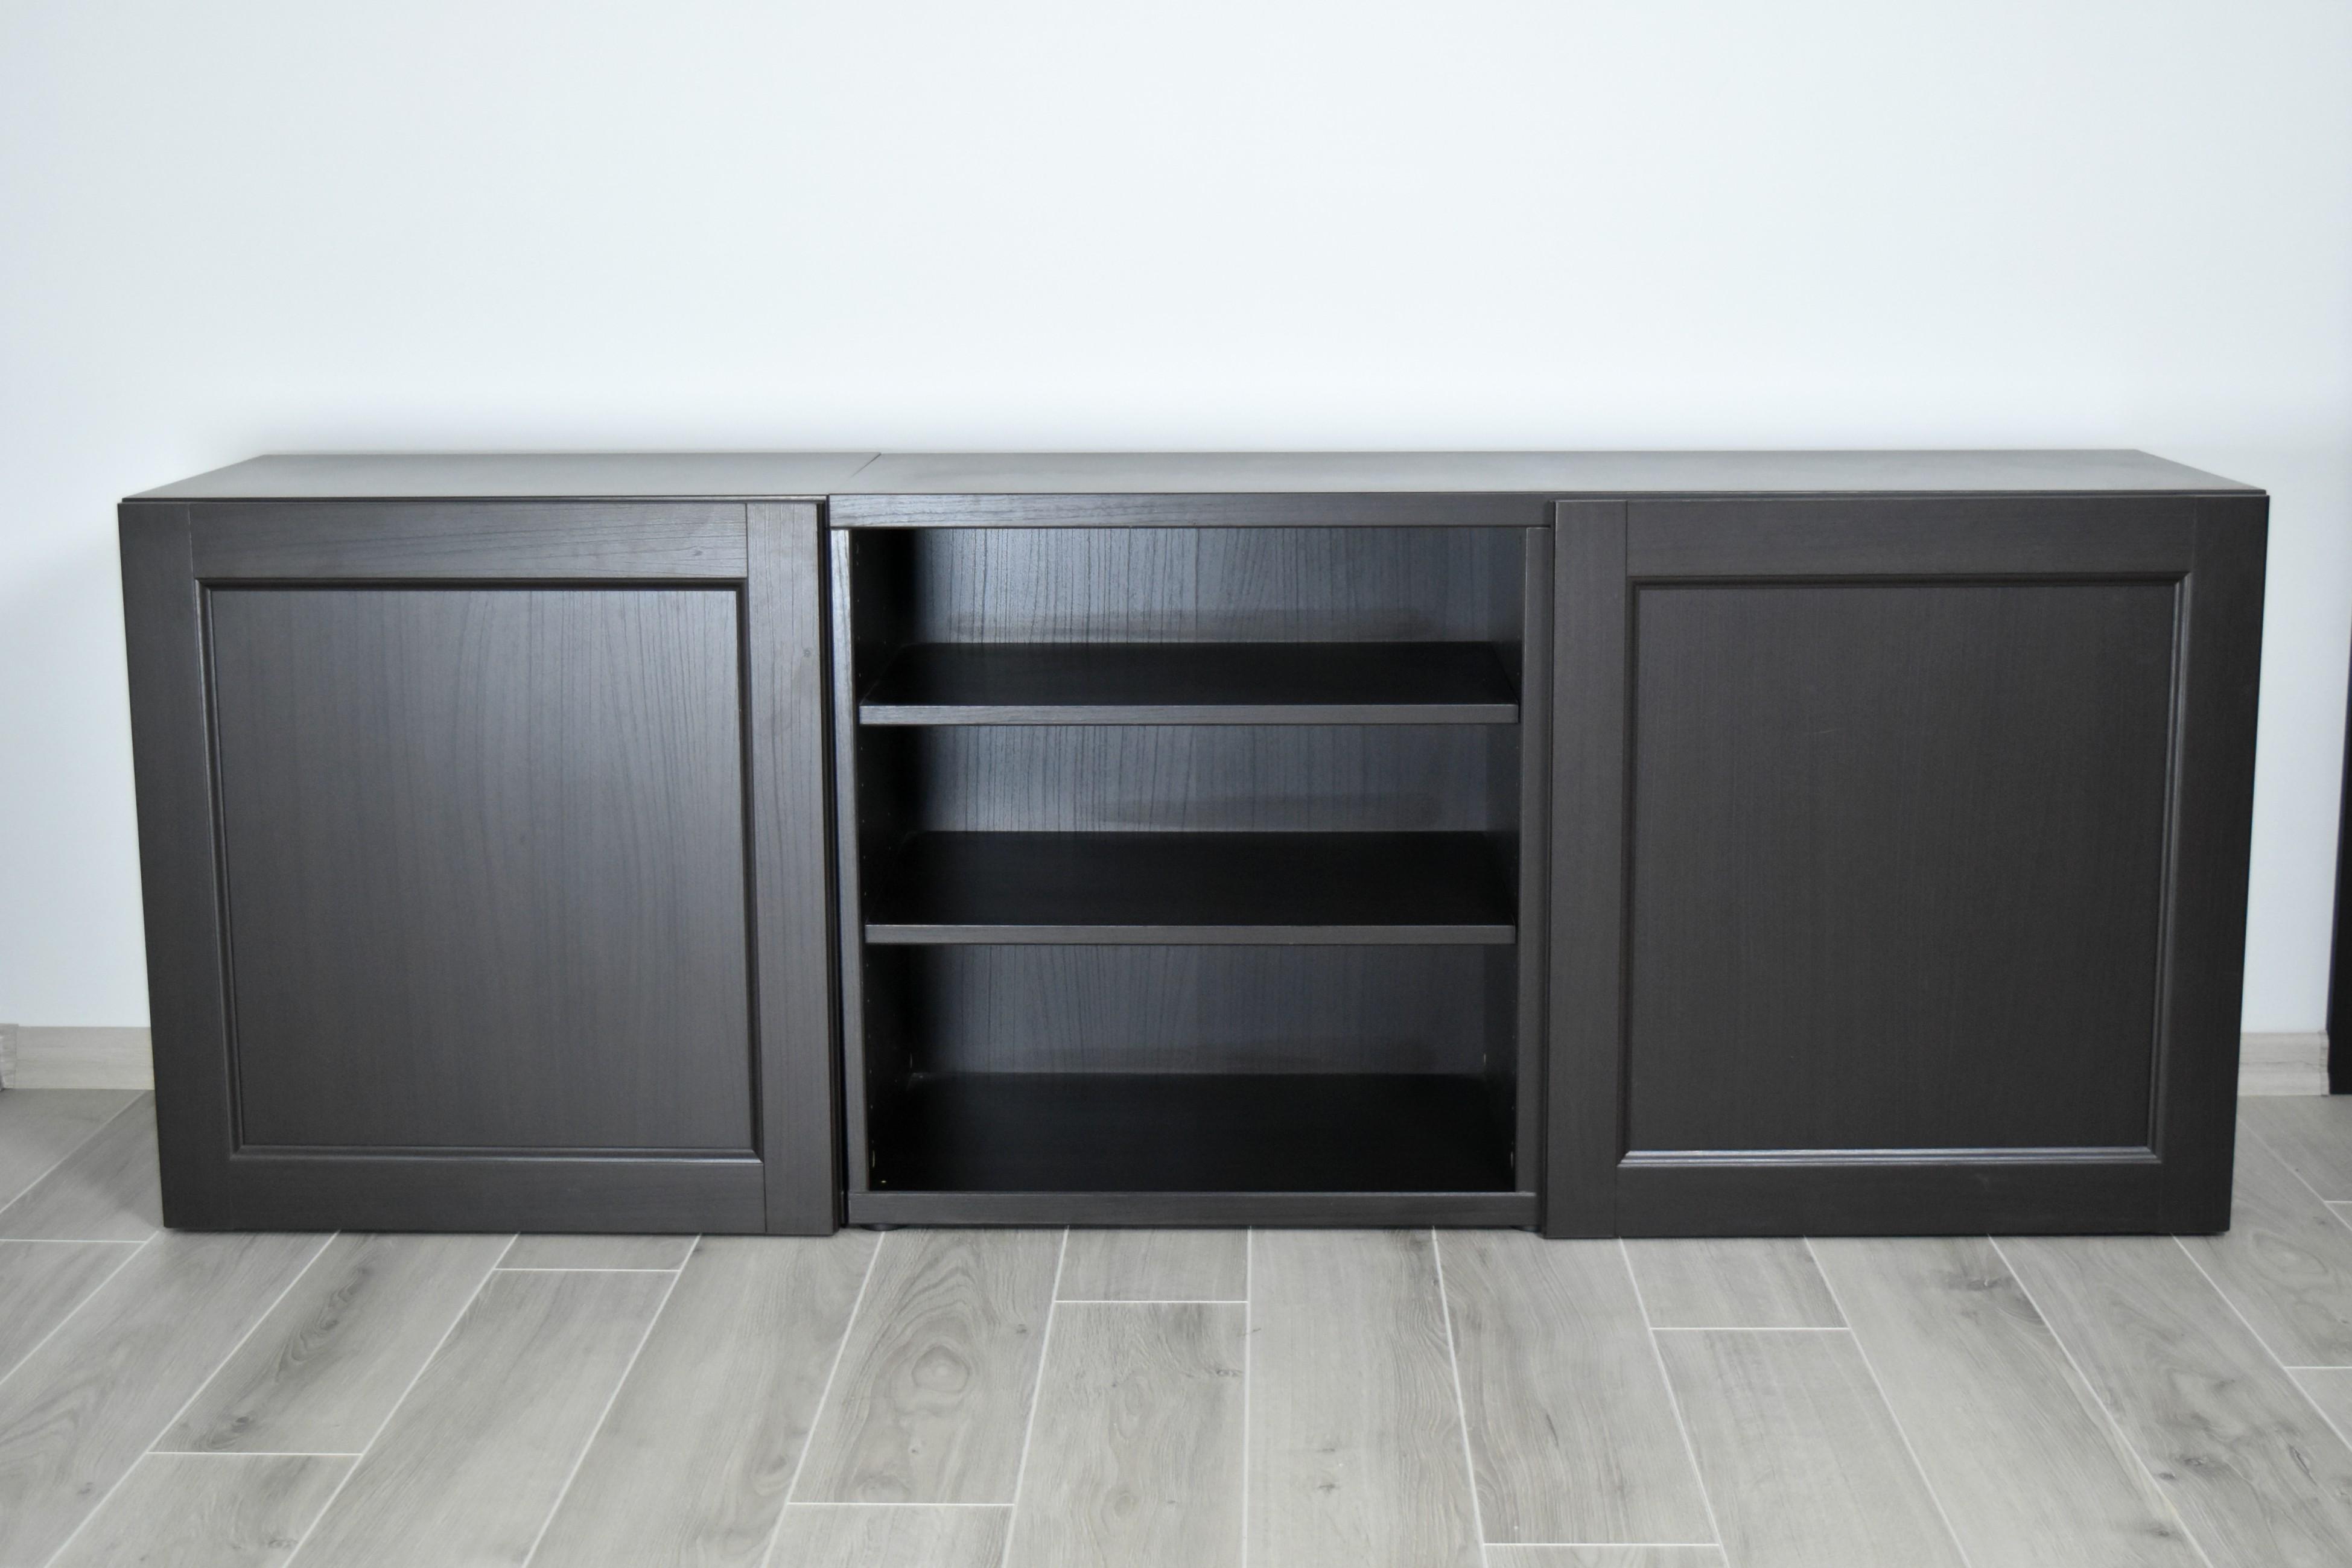 malowanie szafki z mdf besta ikea metamorfoza projekt dom. Black Bedroom Furniture Sets. Home Design Ideas